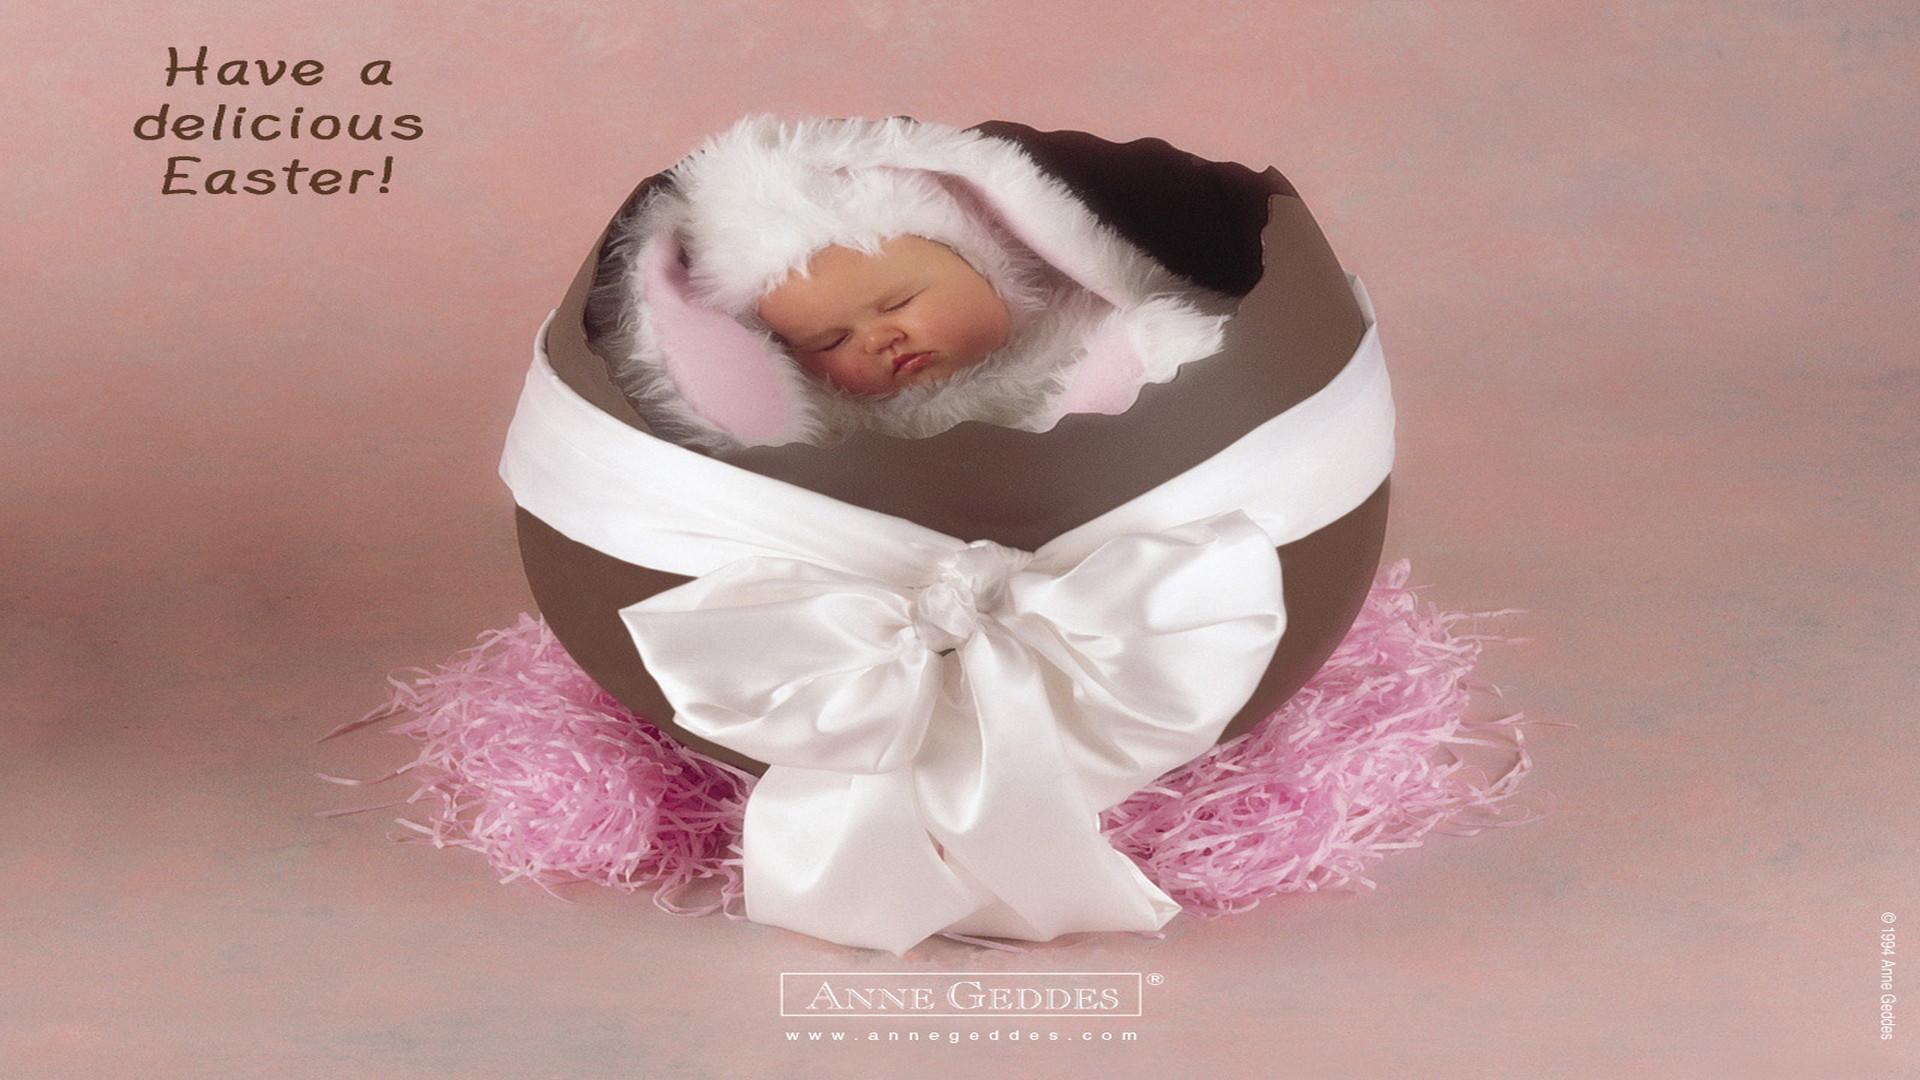 Cute Newborn Baby Girl Wallpapers Anne Geddes Christmas Babies Wallpaper 64 Images